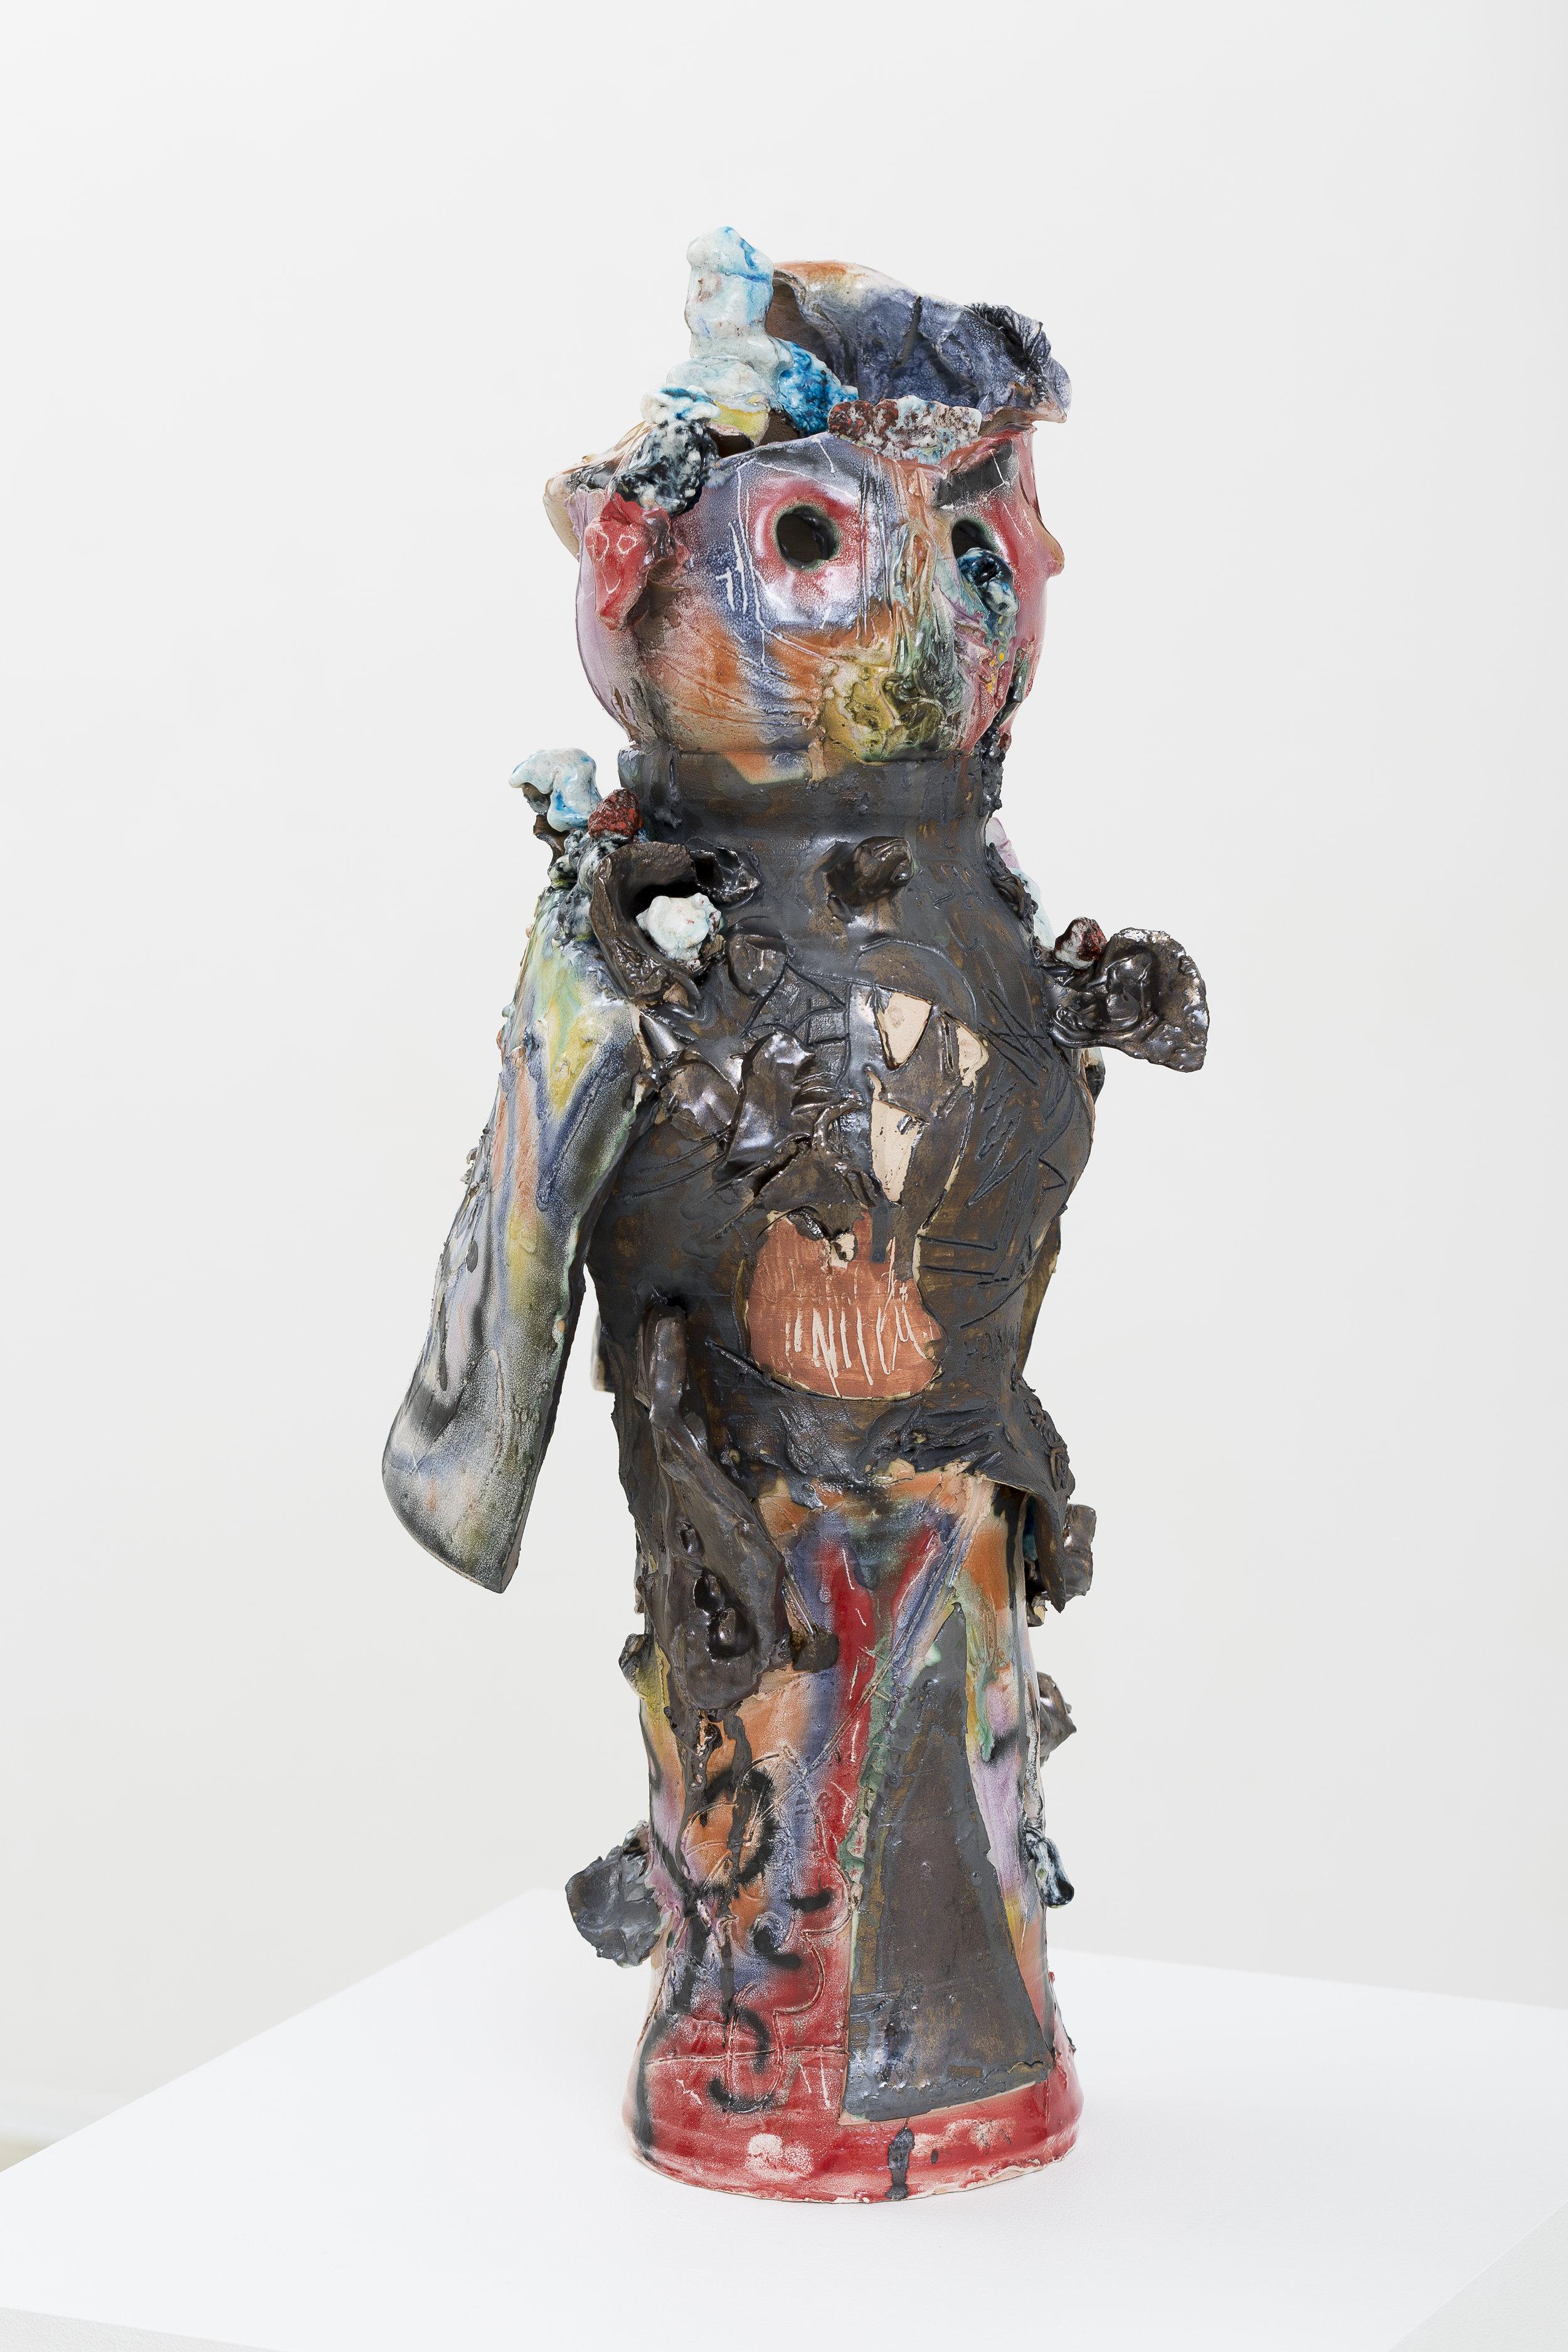 RYAN HANCOCK  Tall Space Boy 2016 glazed ceramic 65 × 40 × 30 cm